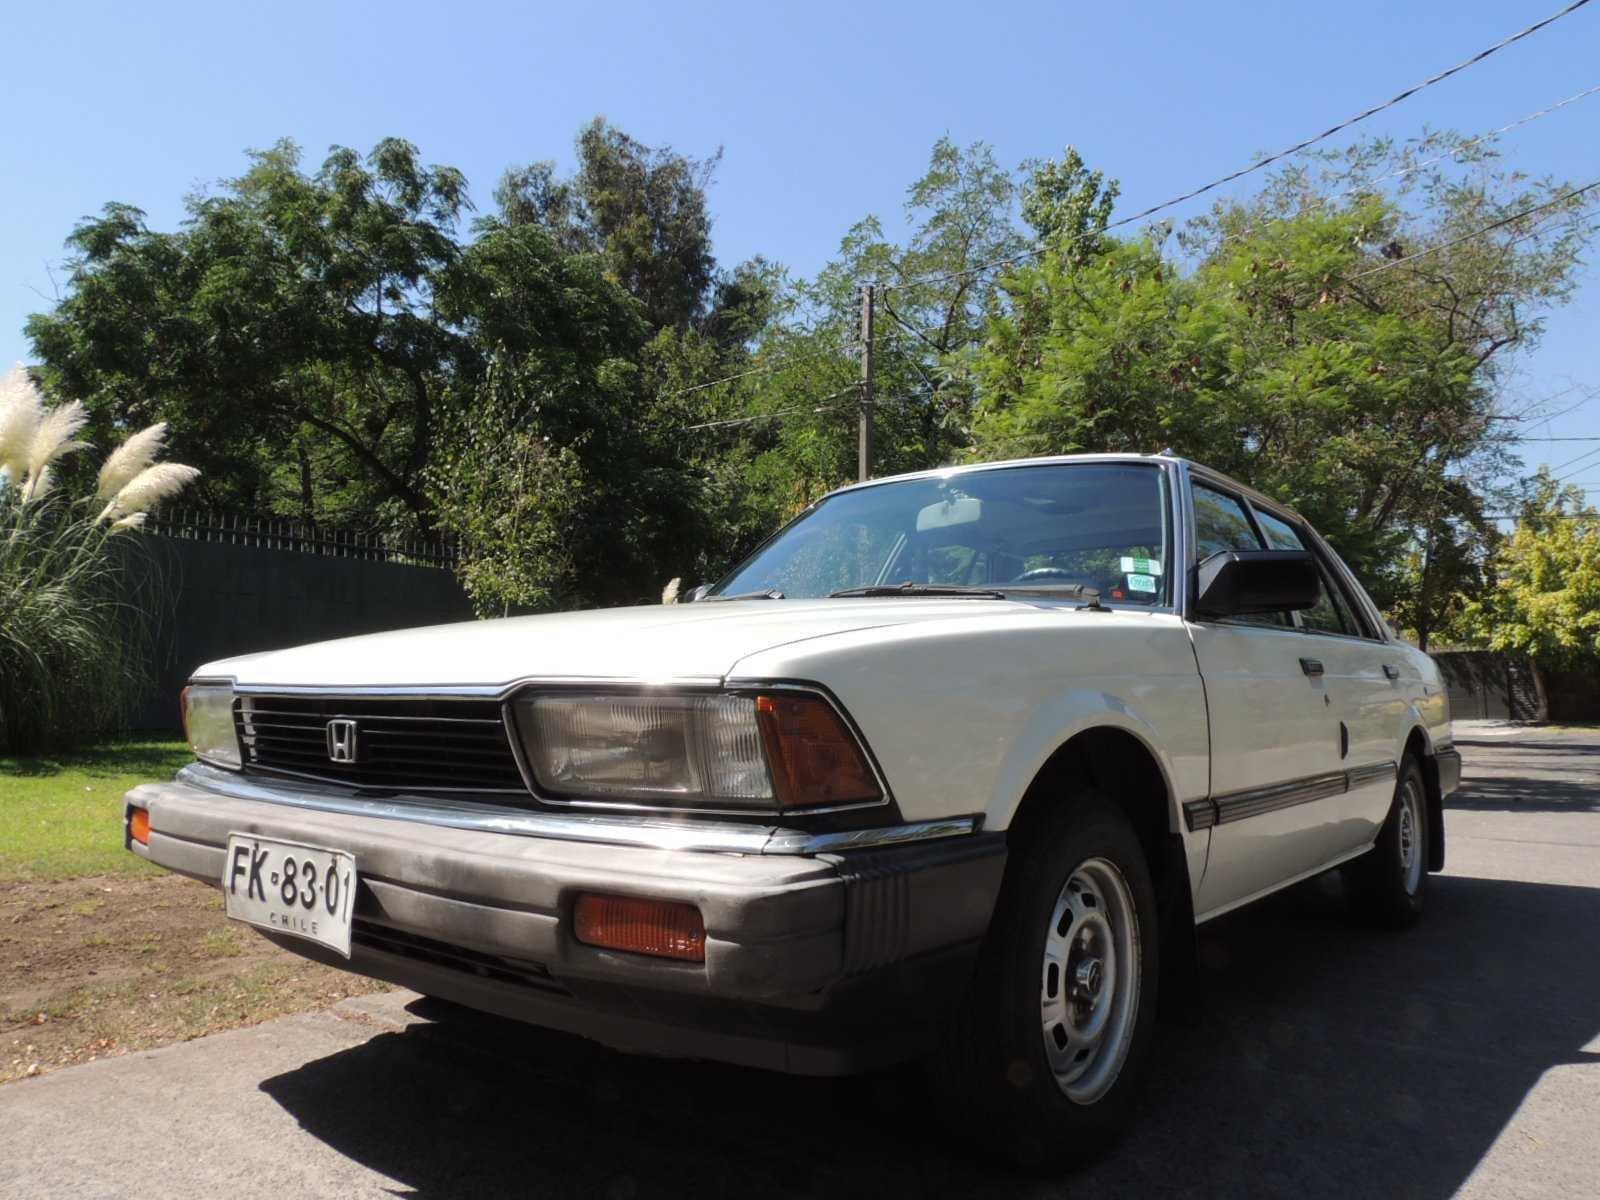 Honda Accord 1.6 EX Hondamatic 1983 Rutamotor Clásicos (20)